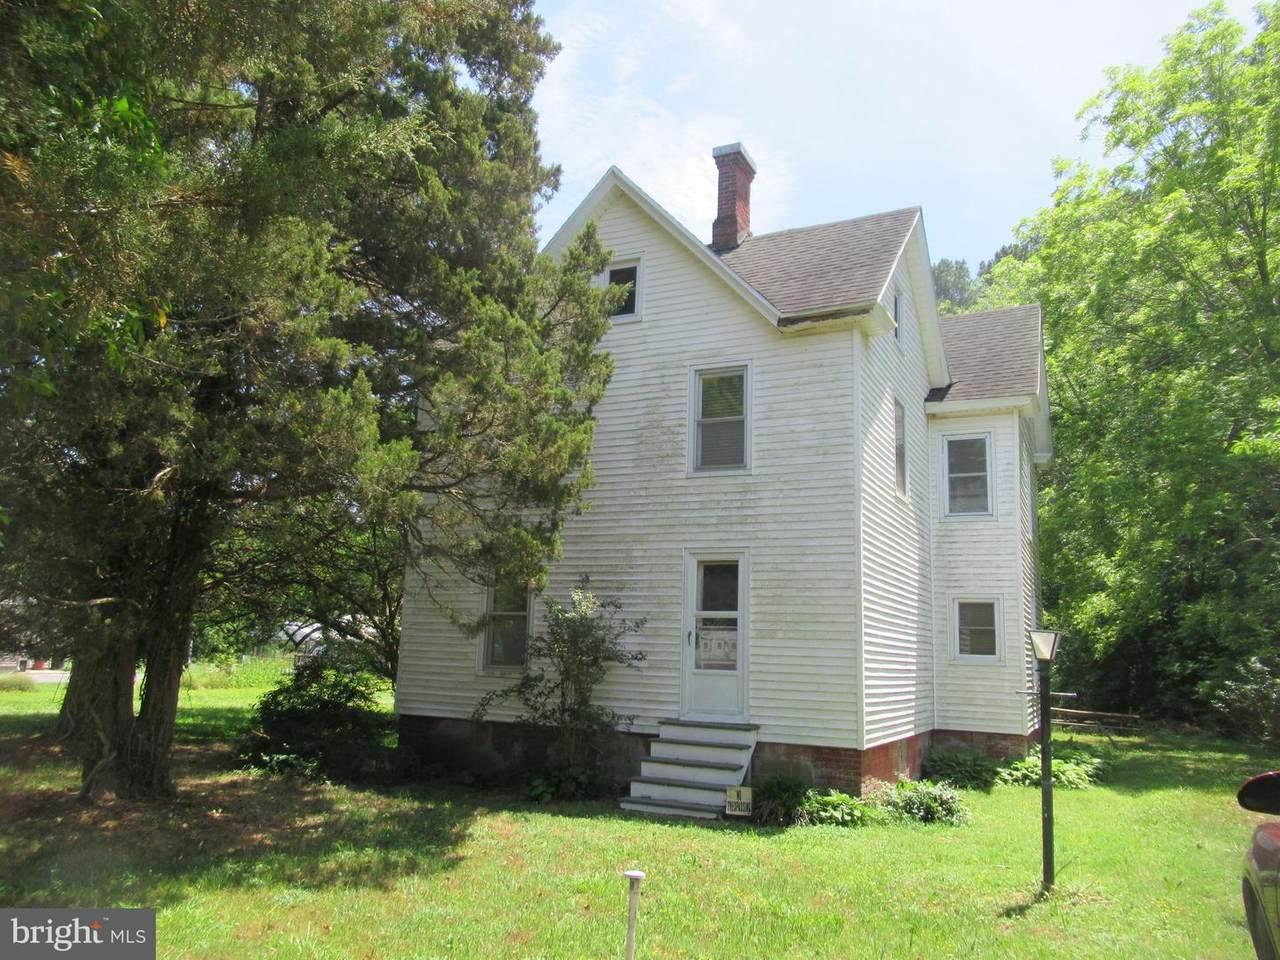 26747 Johnson Creek Road - Photo 1